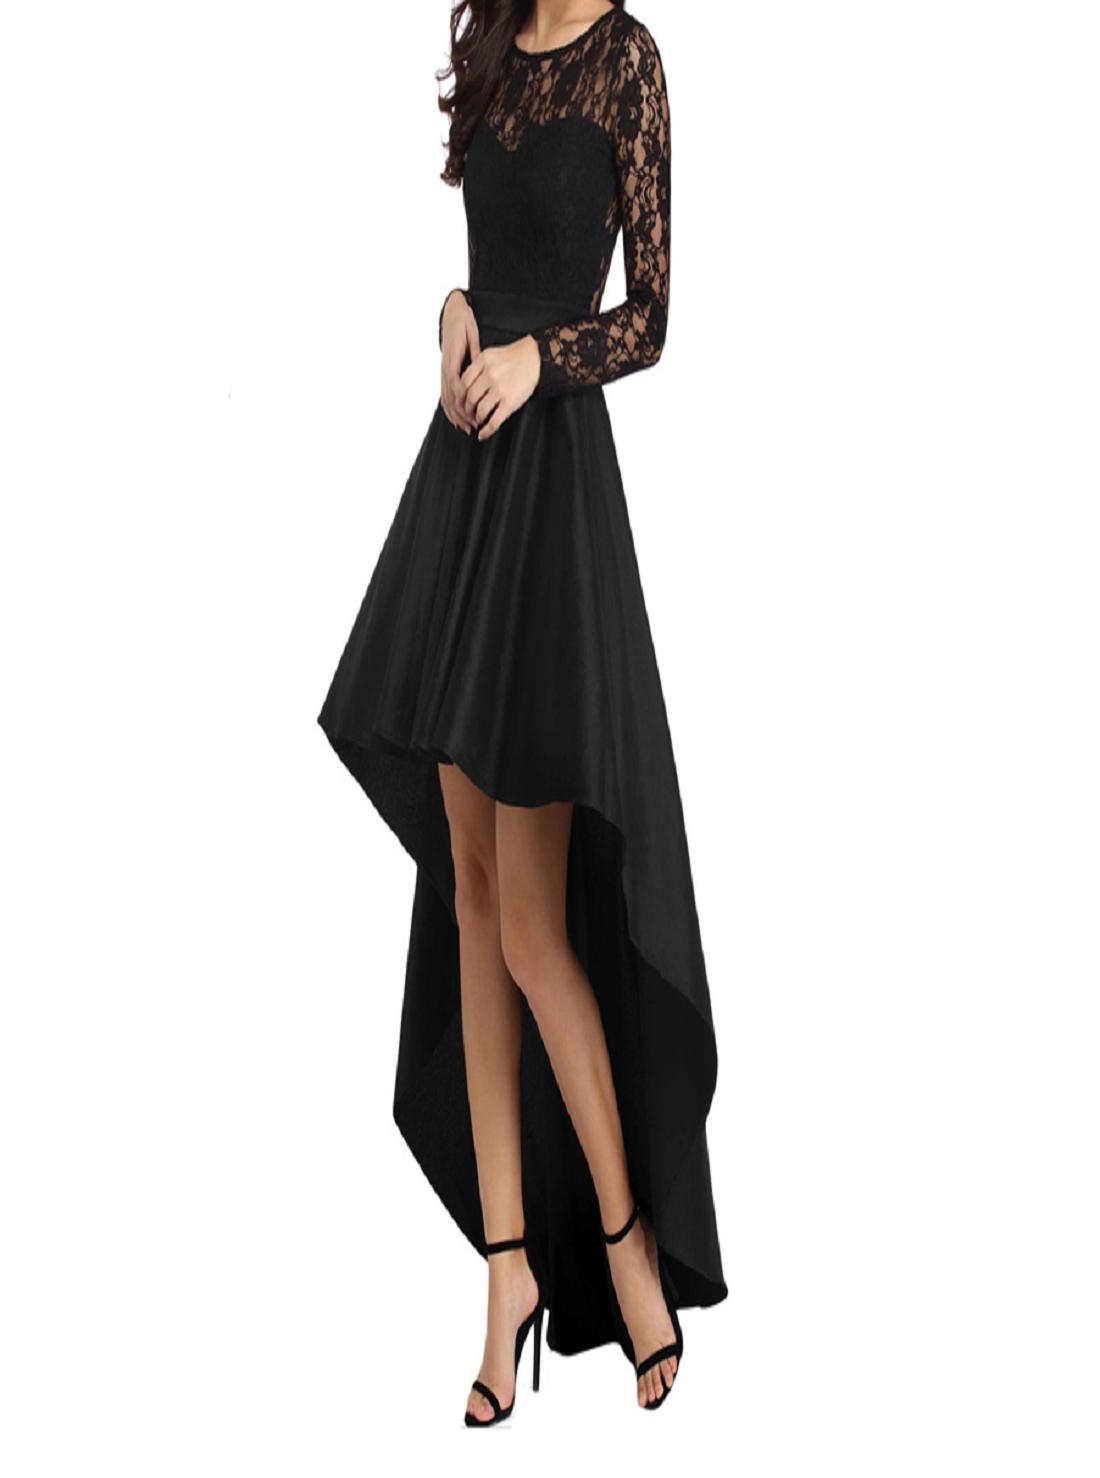 1 Wholesale Round Neck Long Sleeve Dresses